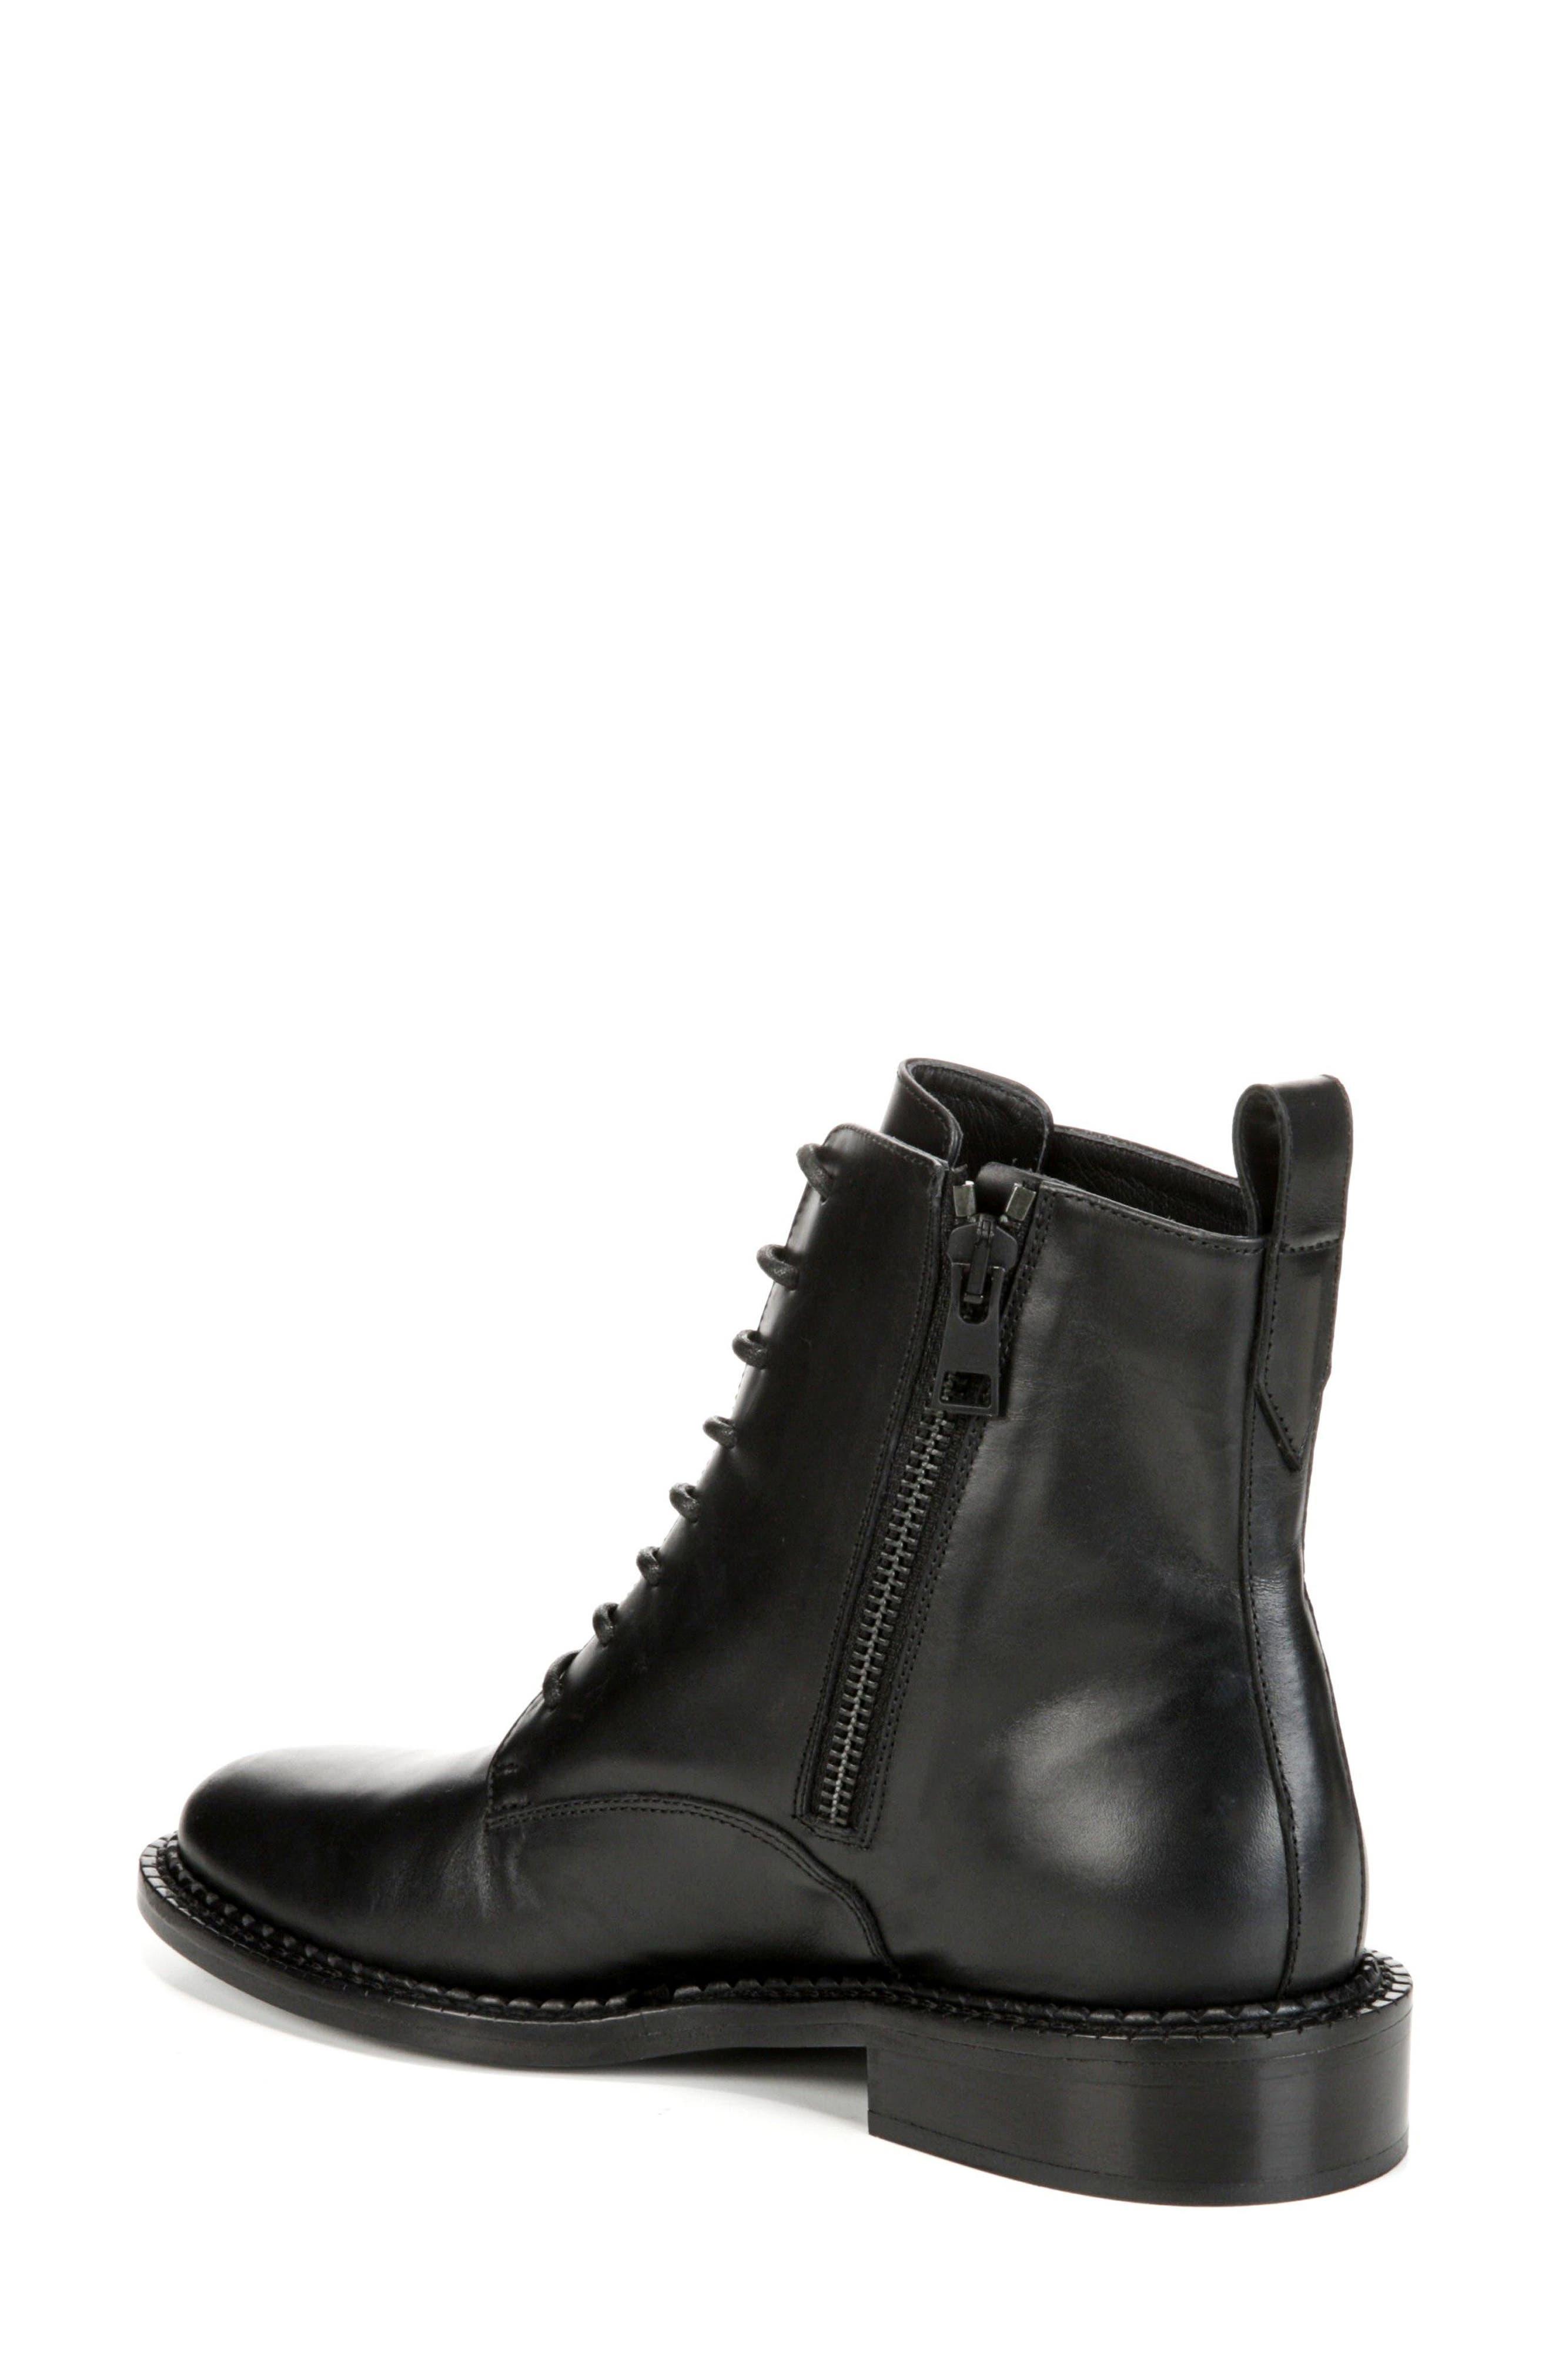 VINCE, Cabria Lace-Up Boot, Alternate thumbnail 2, color, BLACK